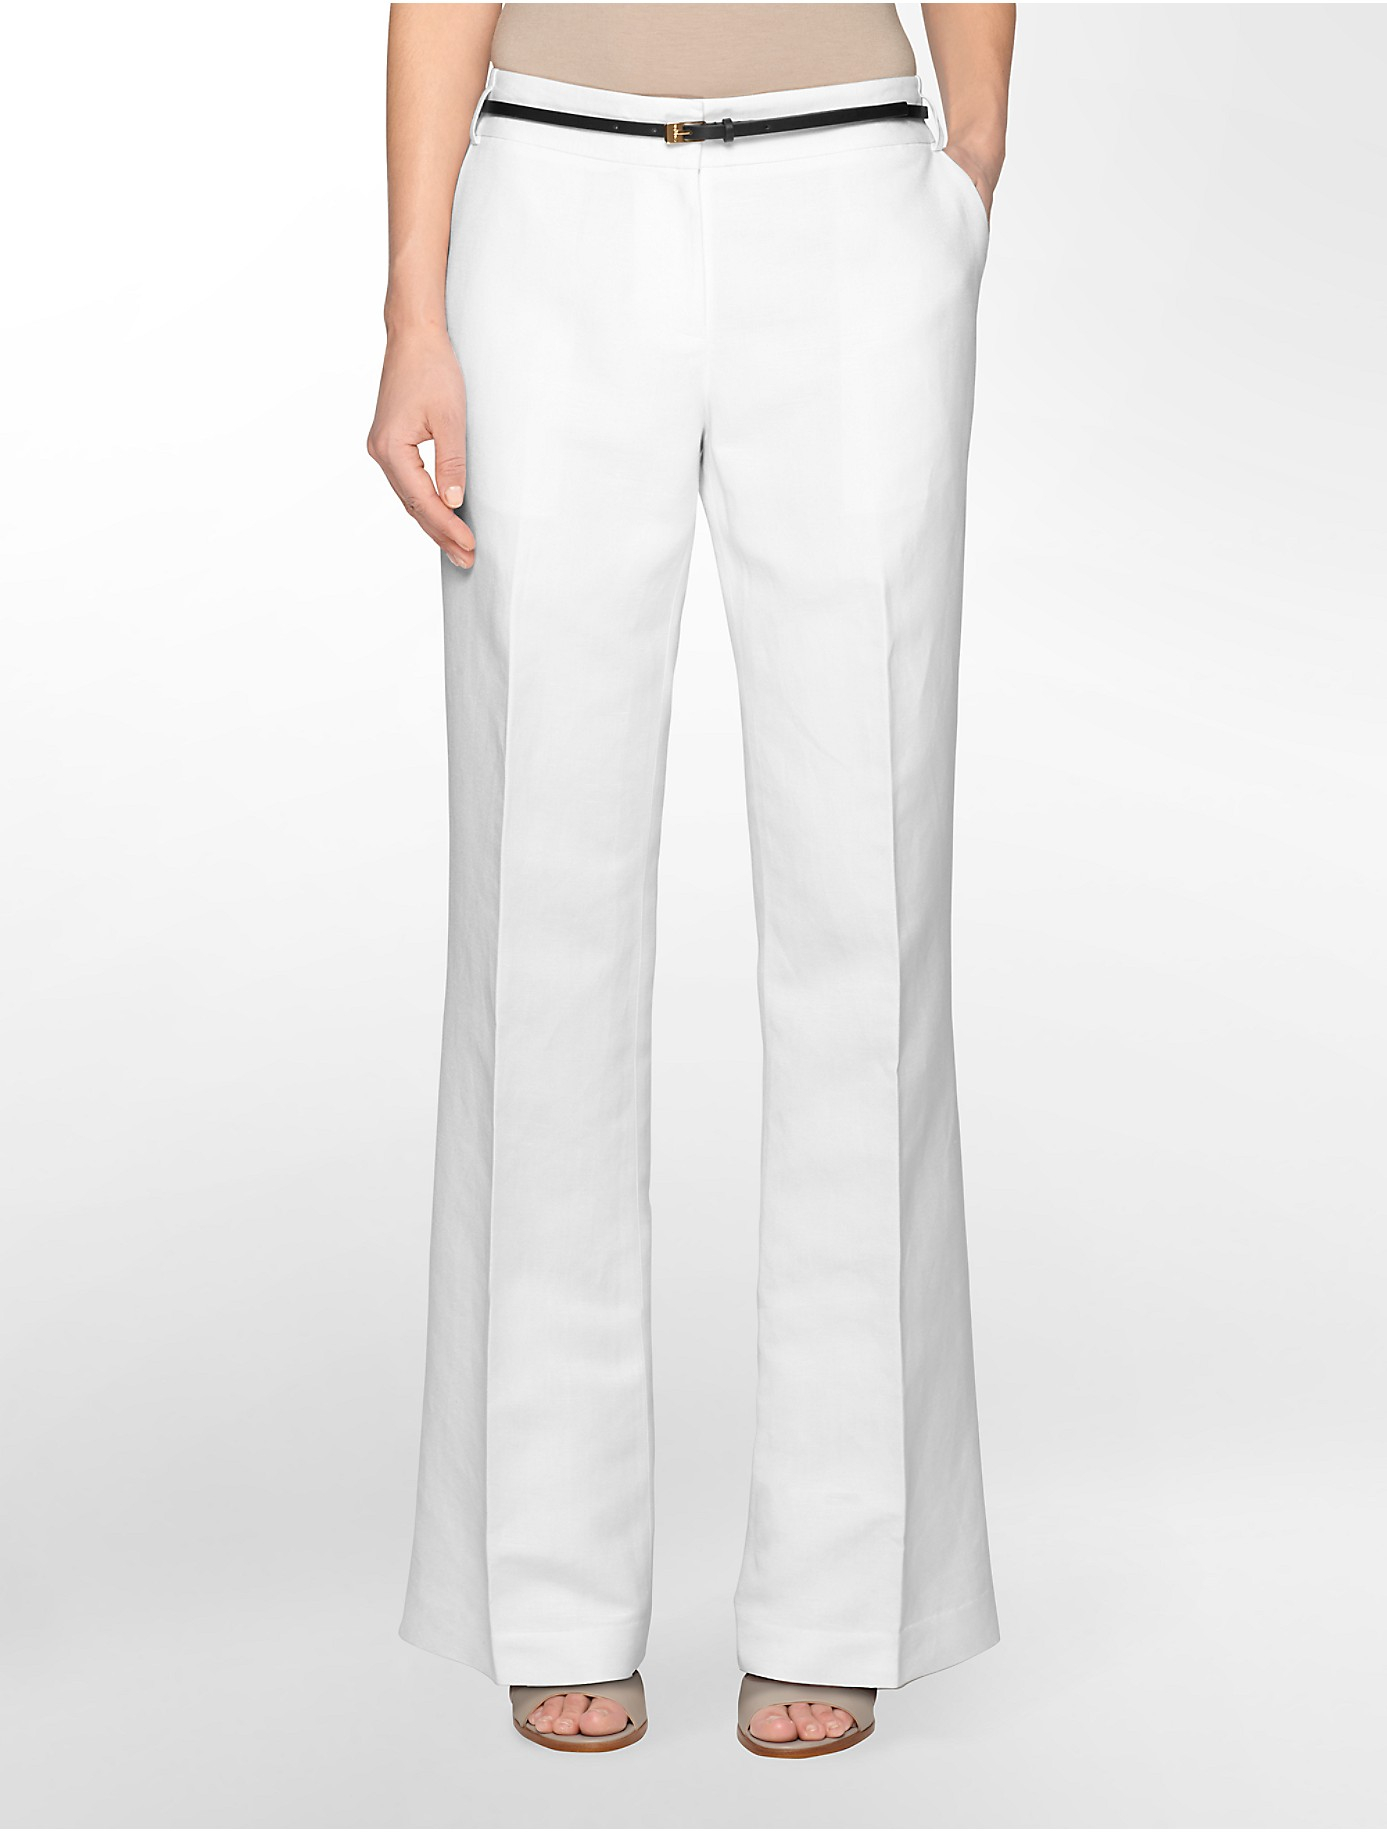 Excellent Perry Ellis Linen Suit Pants In White For Men Bright White  Lyst